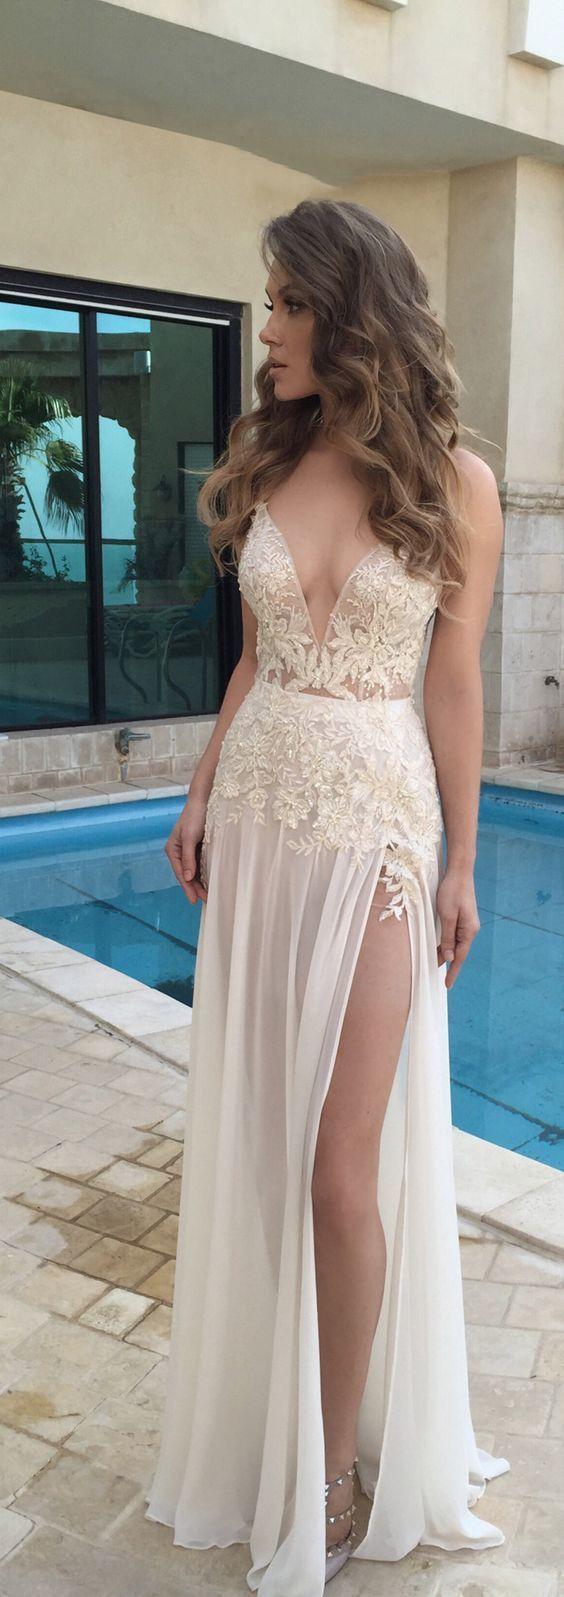 Sexy prom dressv neck chiffon prom dresseslong prom dressformal